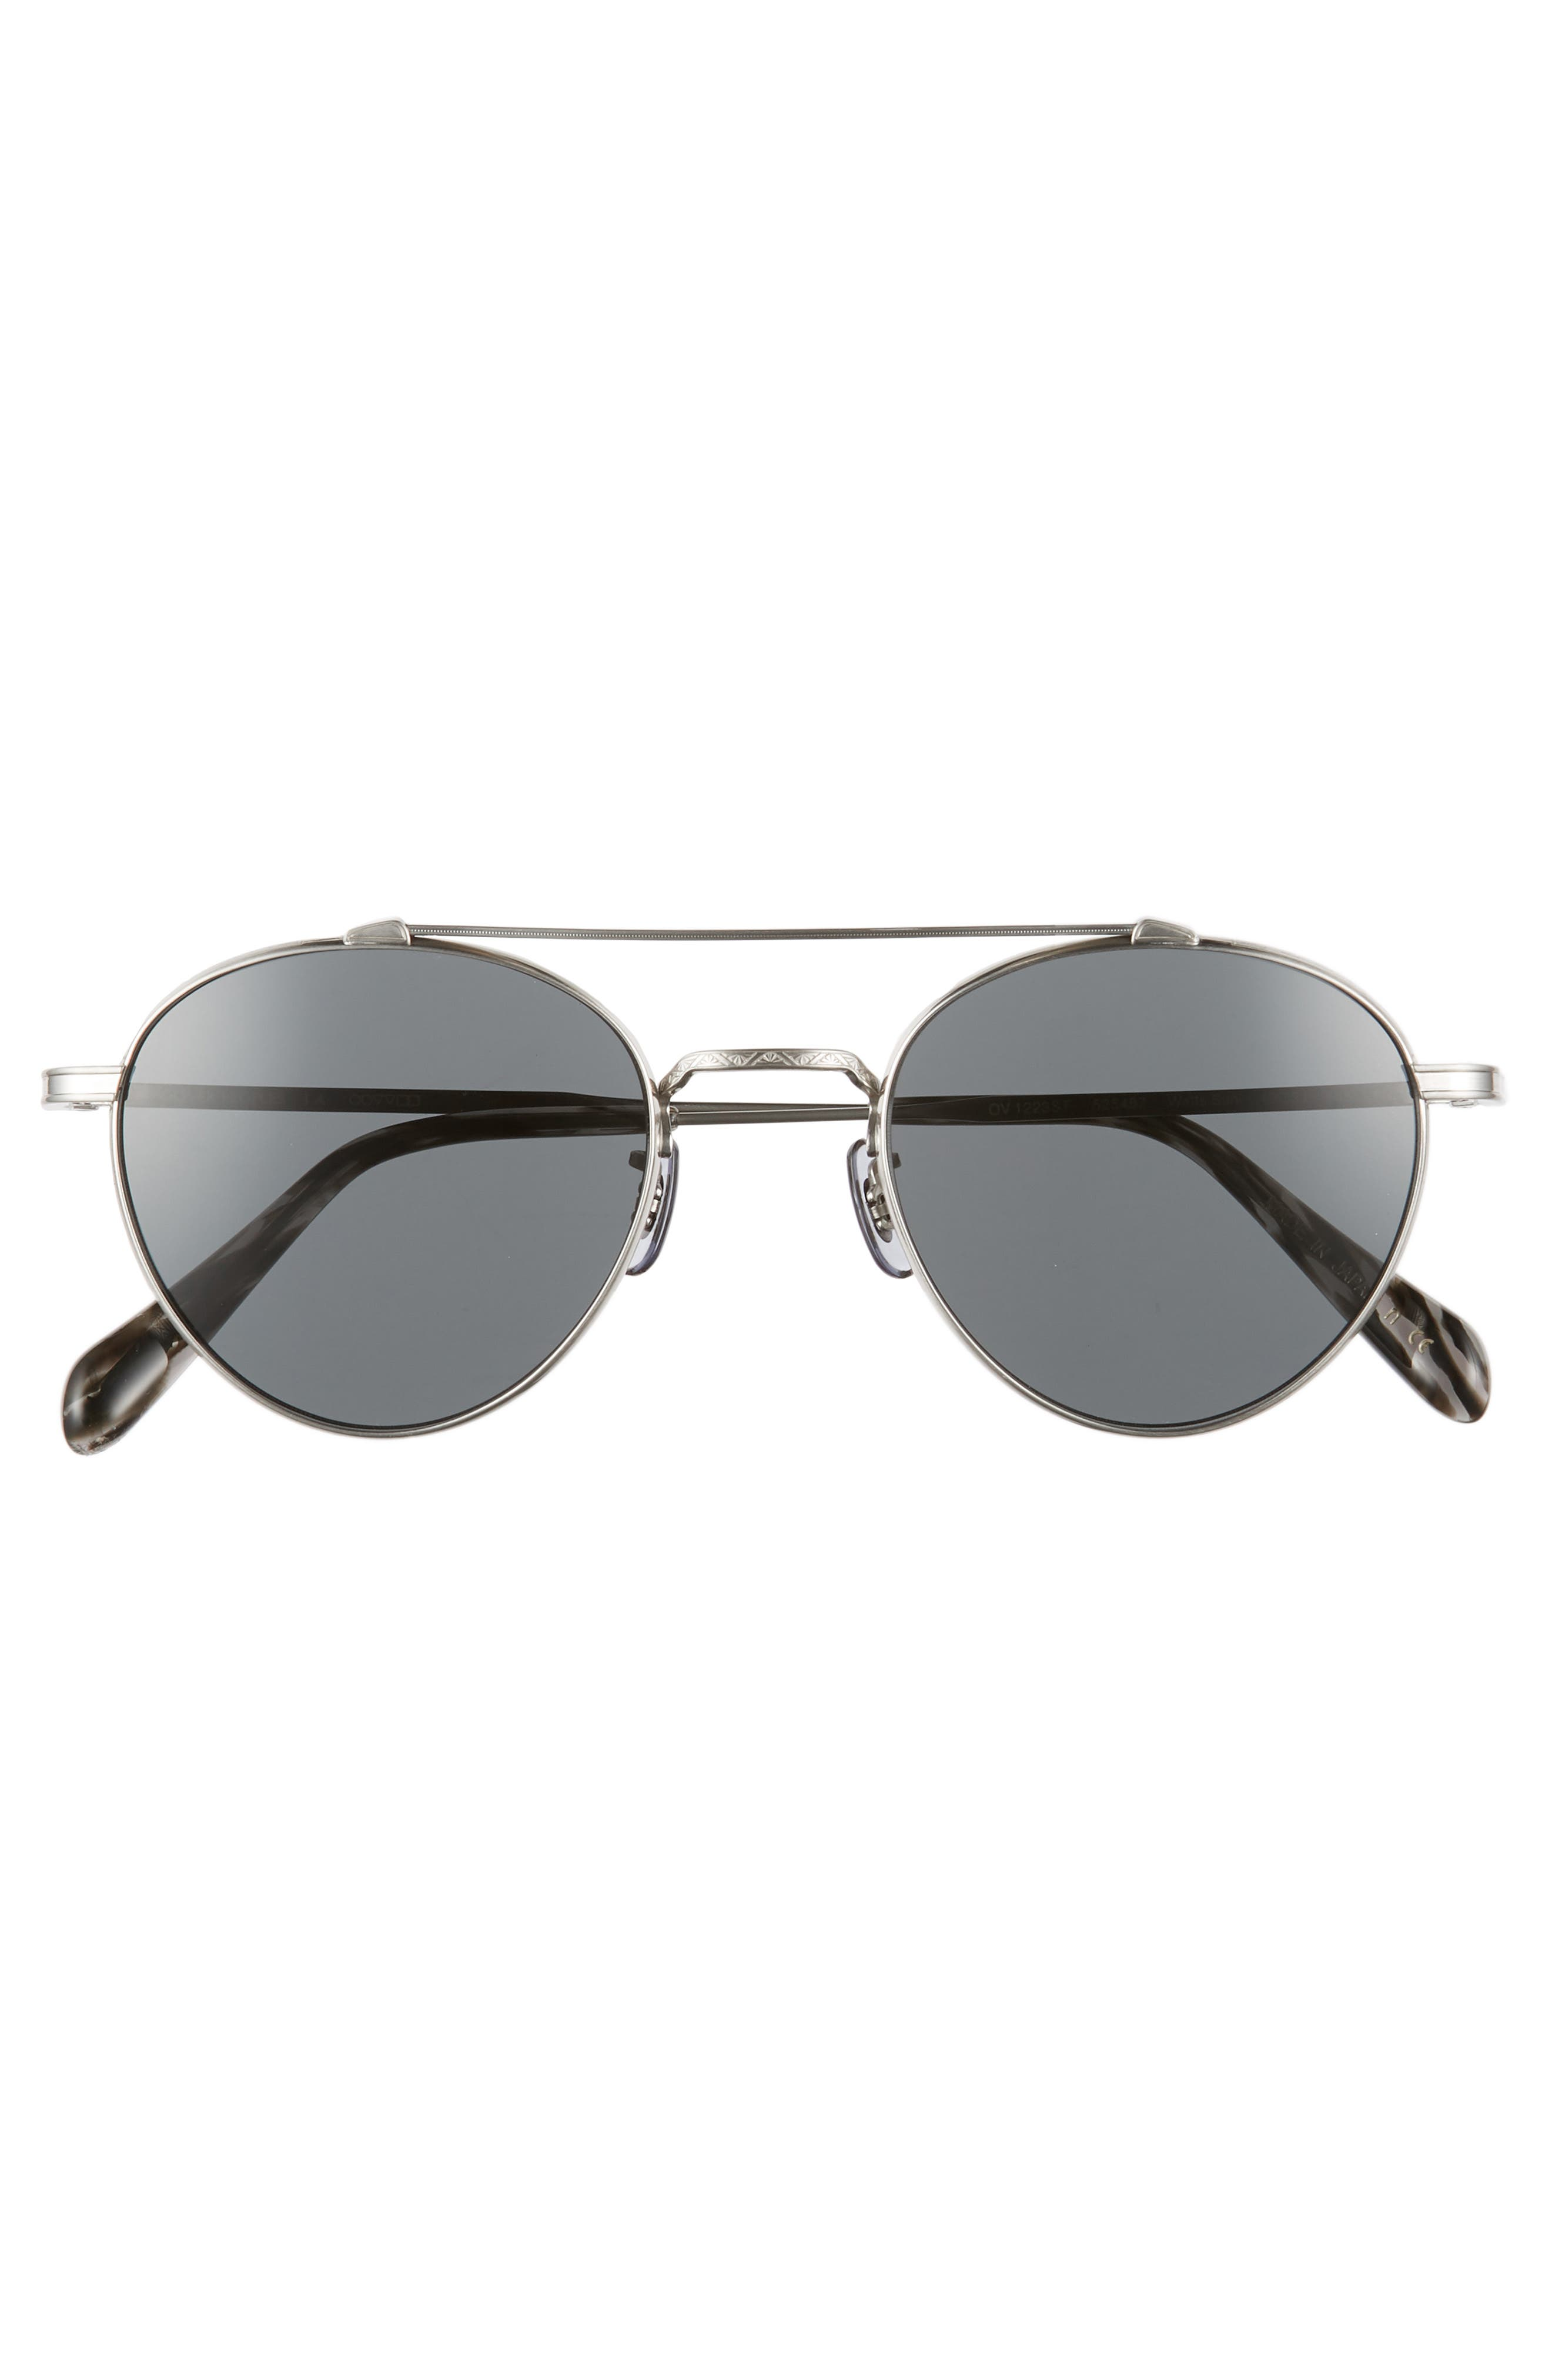 Watts 49mm Round Sunglasses,                             Alternate thumbnail 2, color,                             Grey